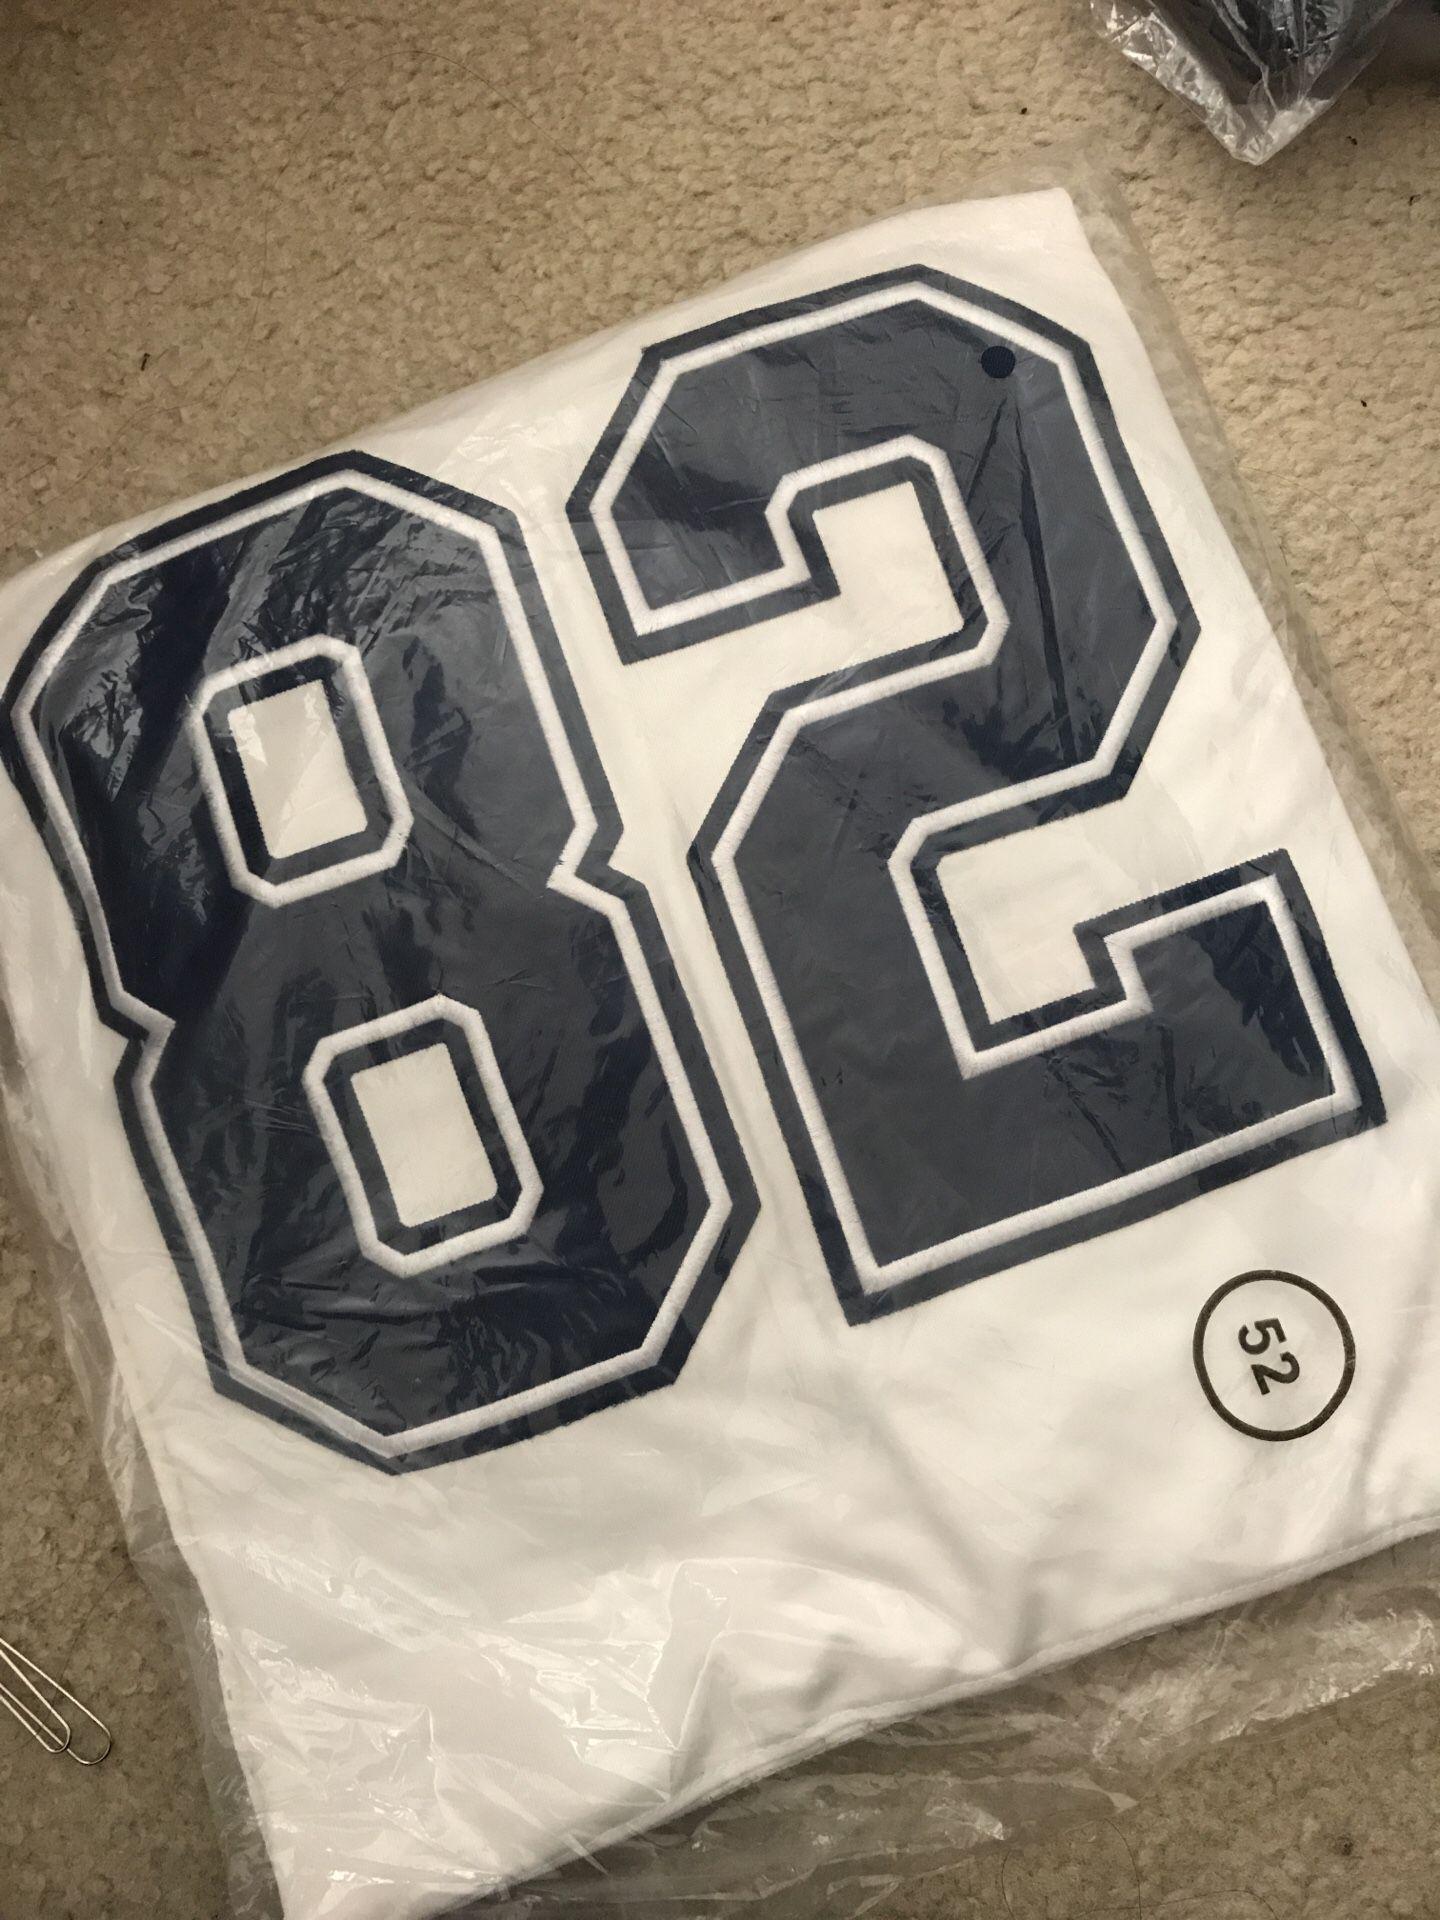 Jason Witten #82 Dallas Cowboys Nike Elite New Stitched Jersey White Size 2XL